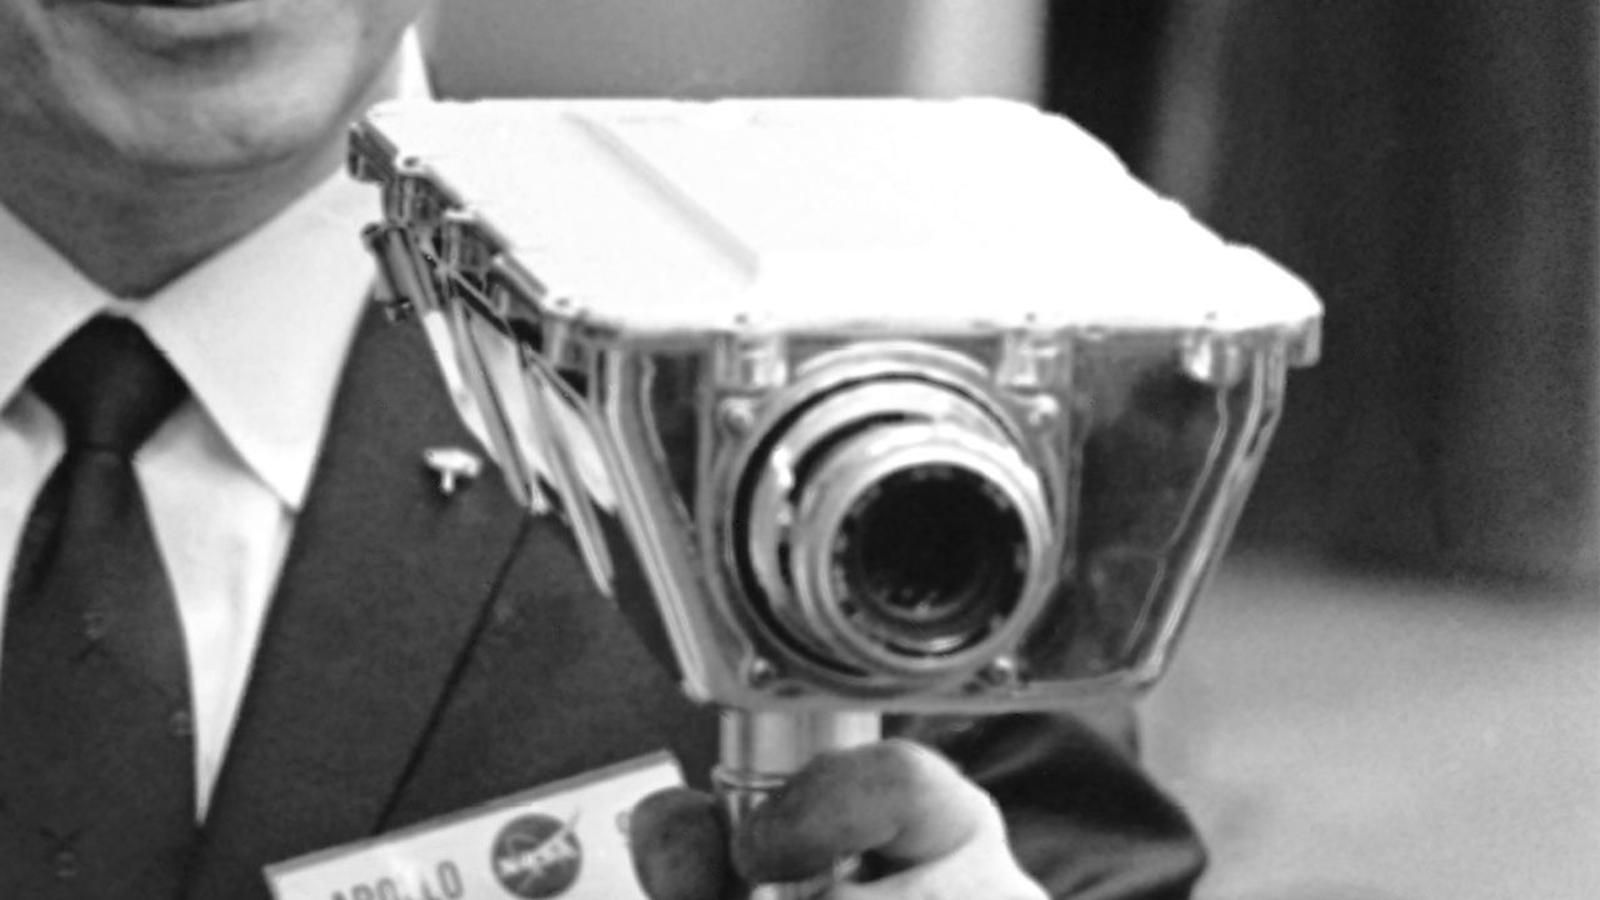 Apollo 11 anniversary: This camera let the world watch historic Apollo 11 moonwalk